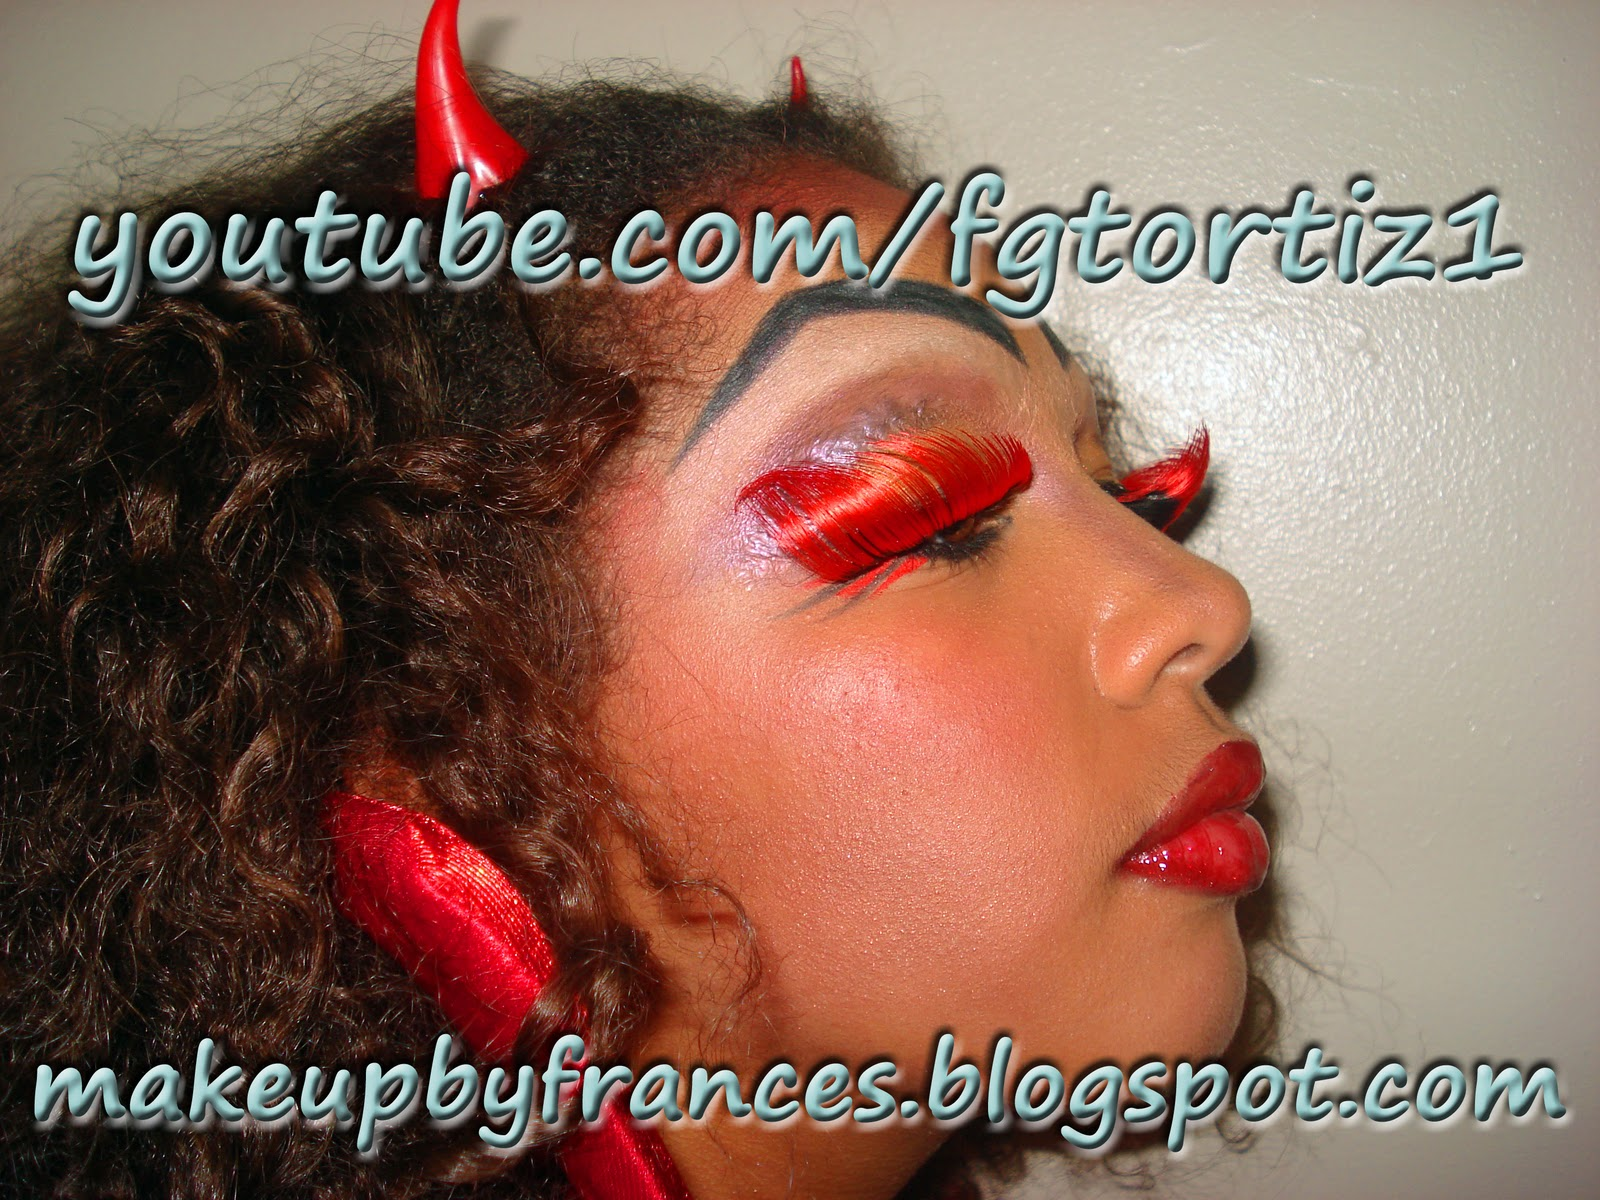 Joven Diablita Tutorial De Maquillaje De Diabla Para Jovenes Dia De - Como-maquillar-a-una-diabla